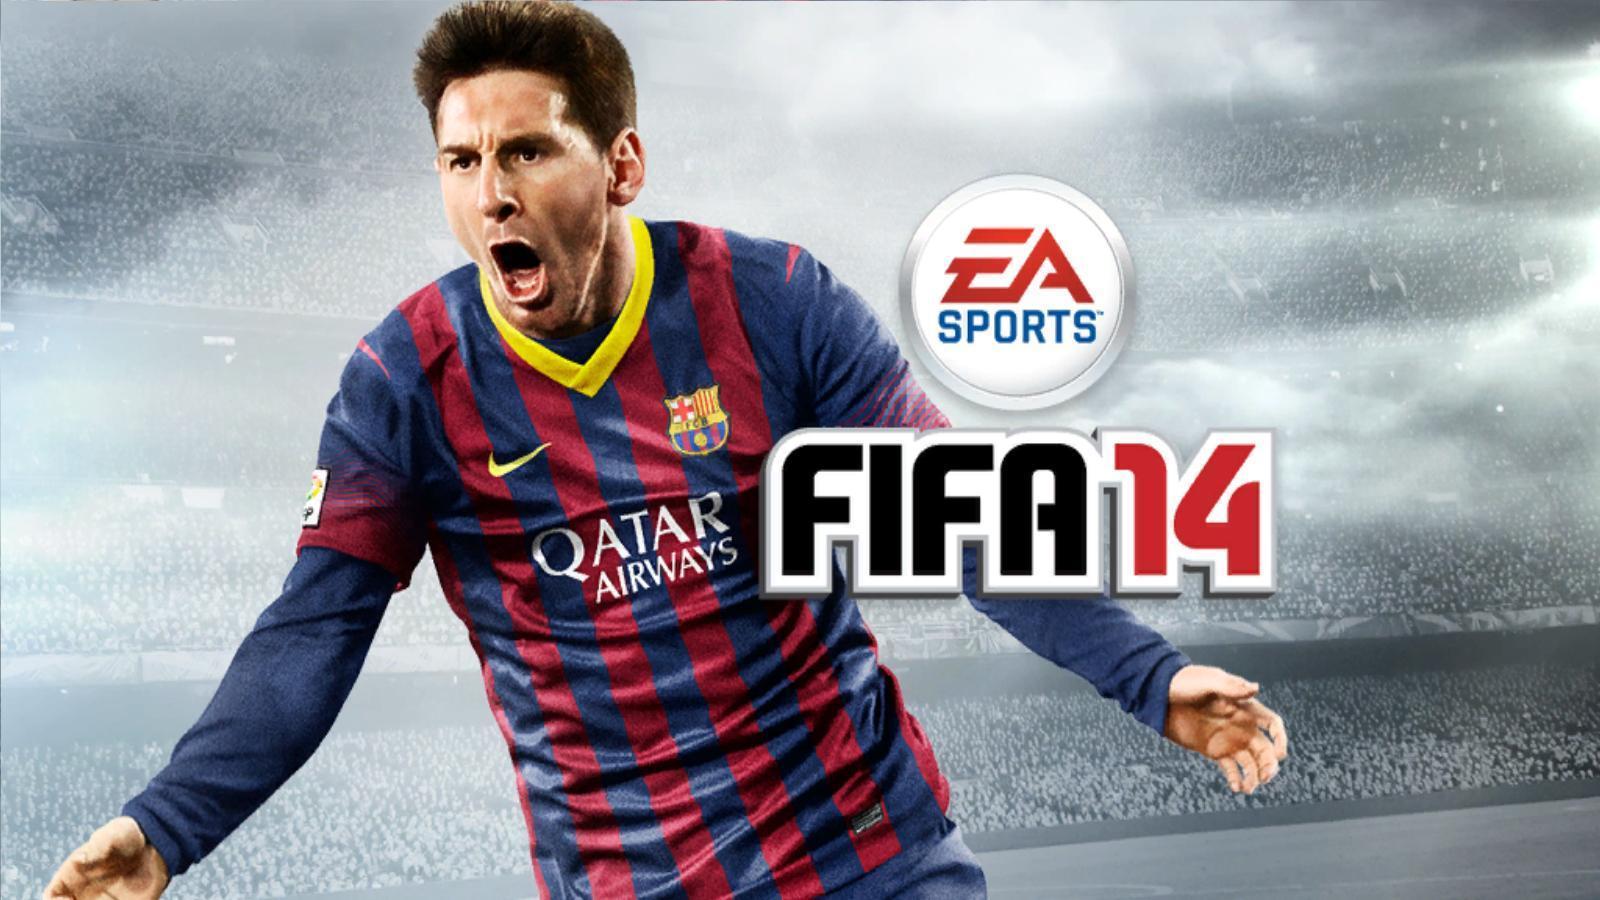 FIFA 14 wallpapers hd